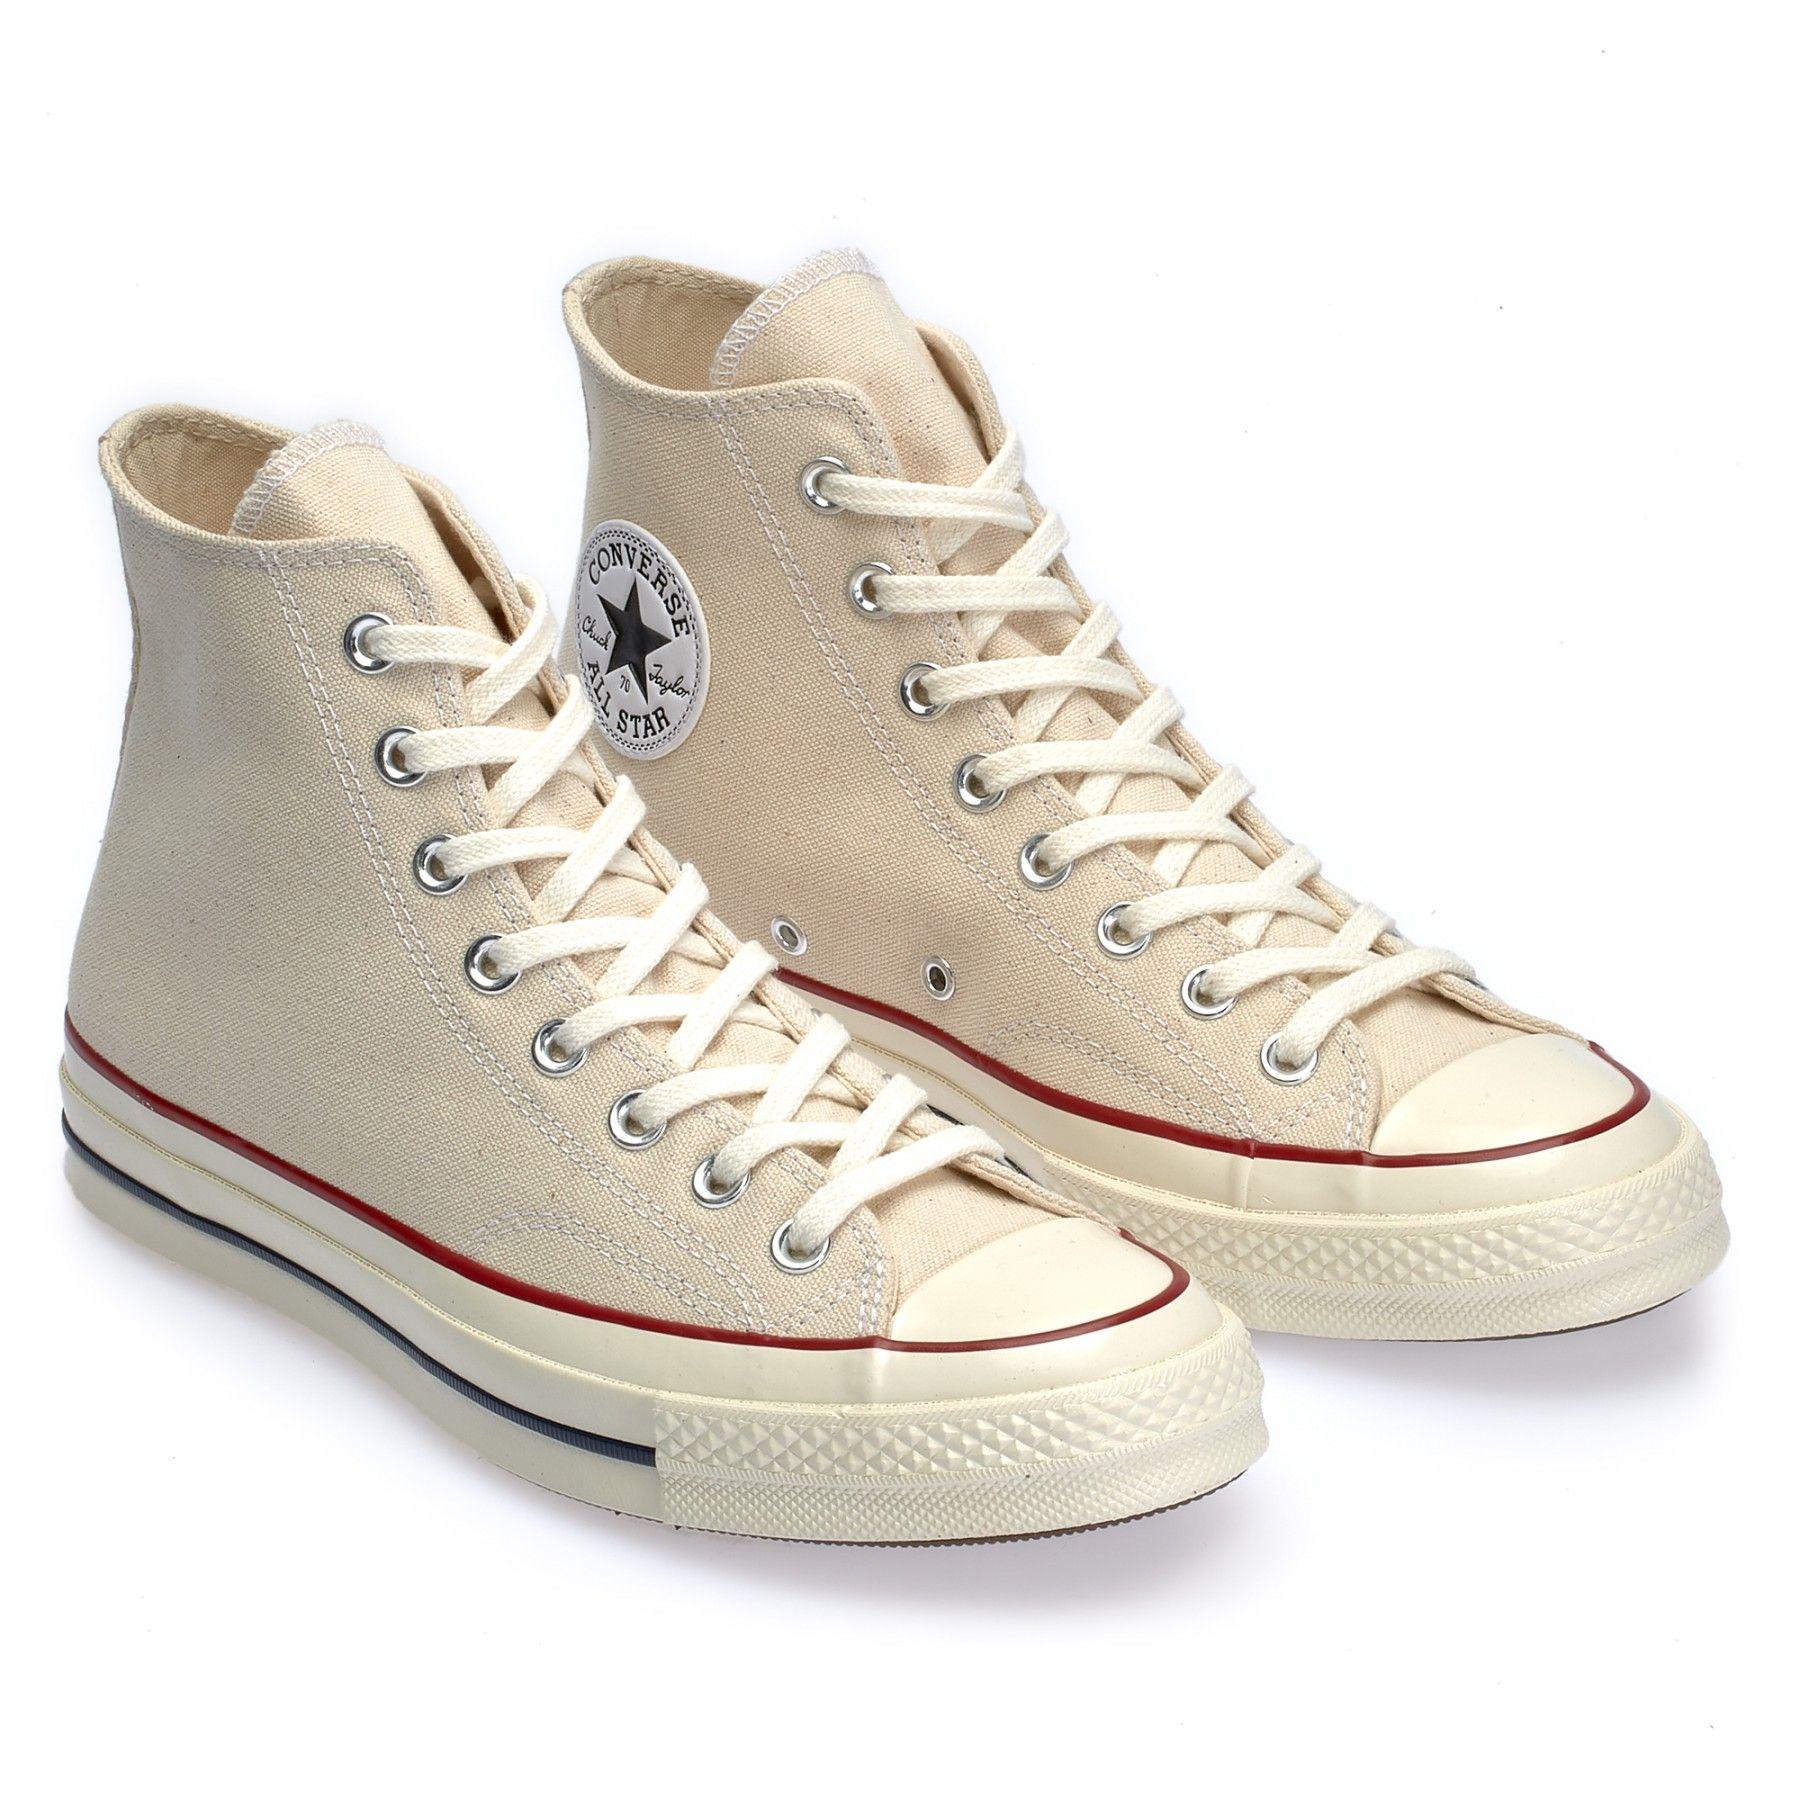 Converse Chuck Taylor All Star '70 Hi (Egret) | Shoes in